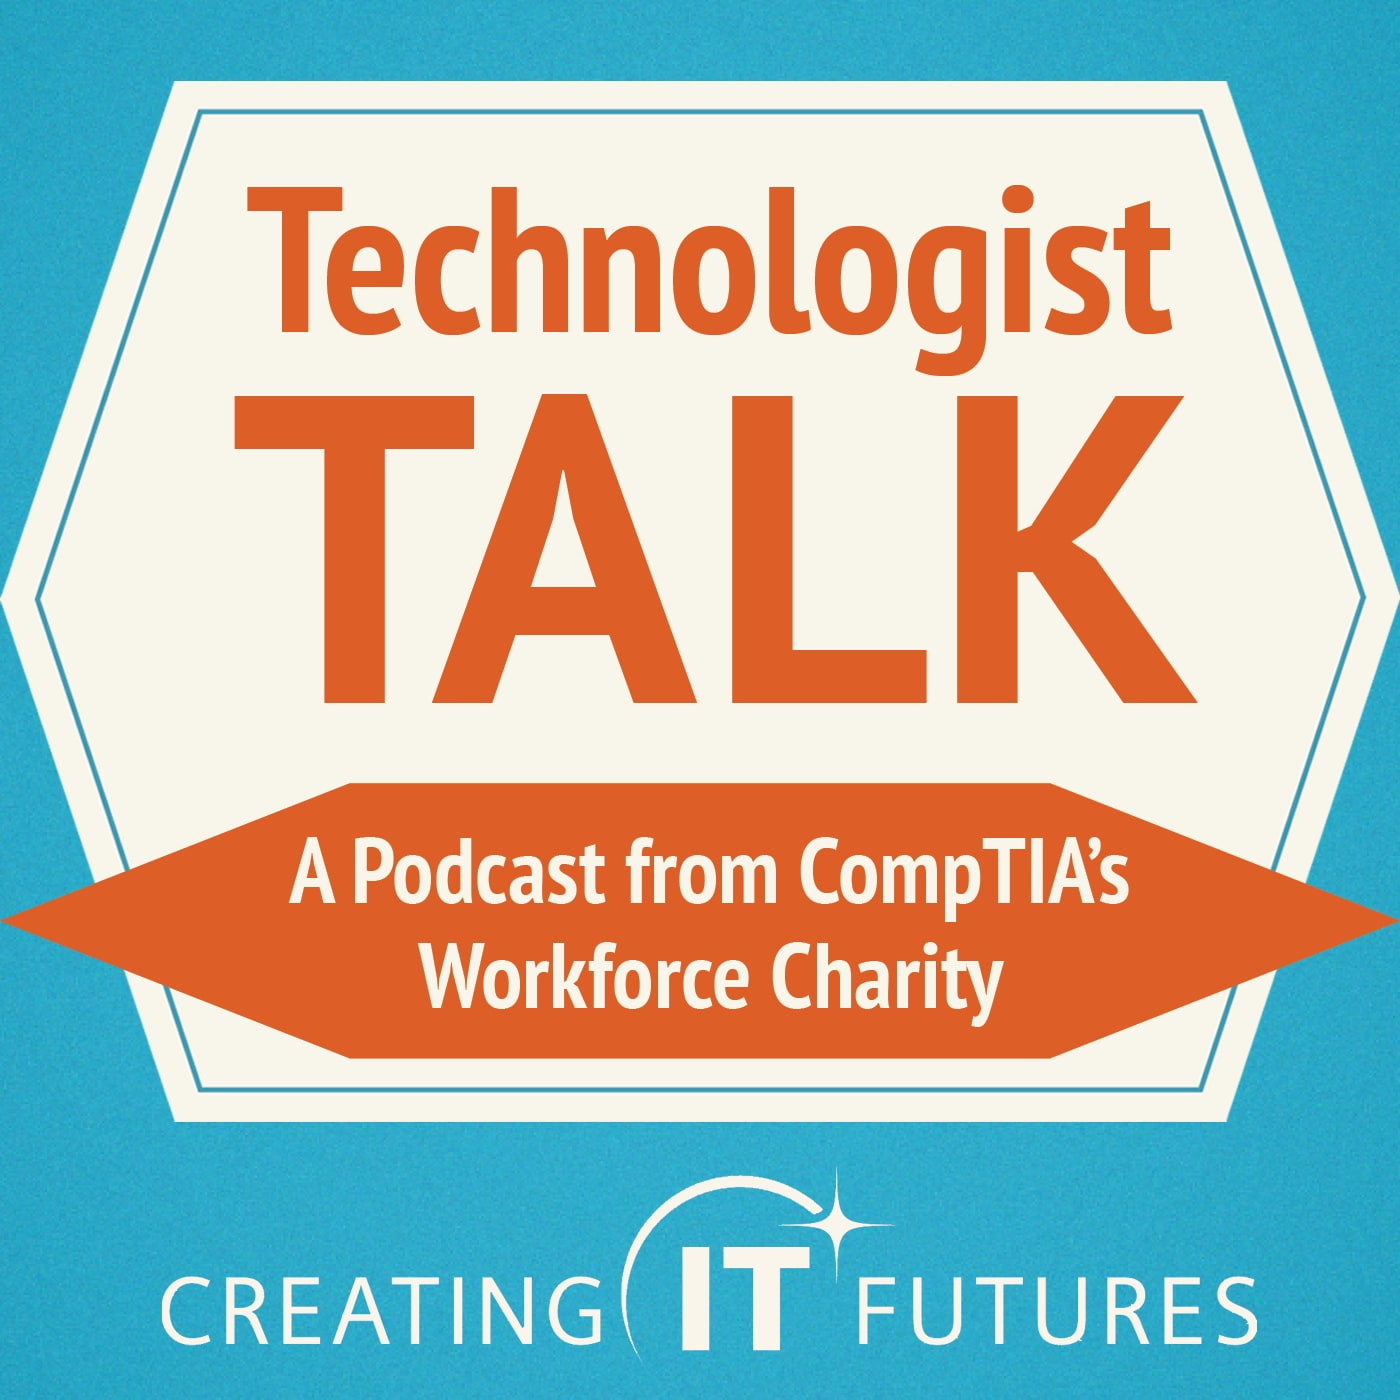 Technologist Talk